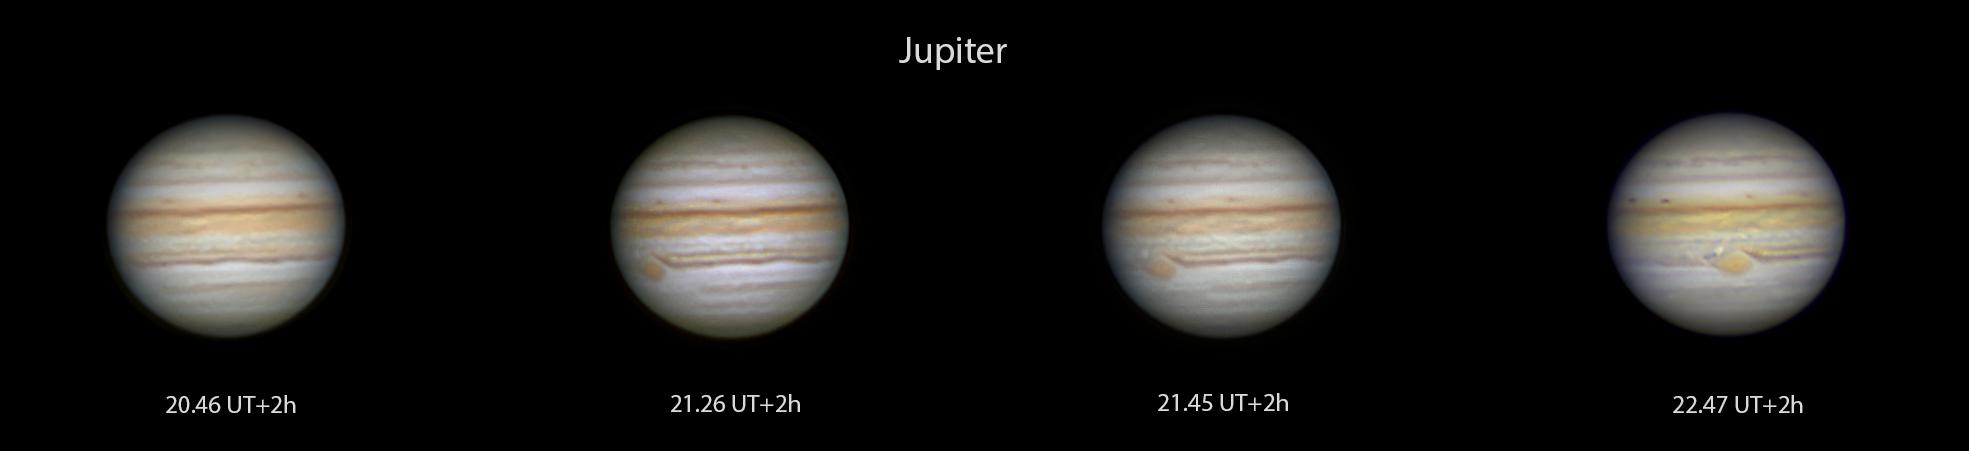 Jupiters Rotation